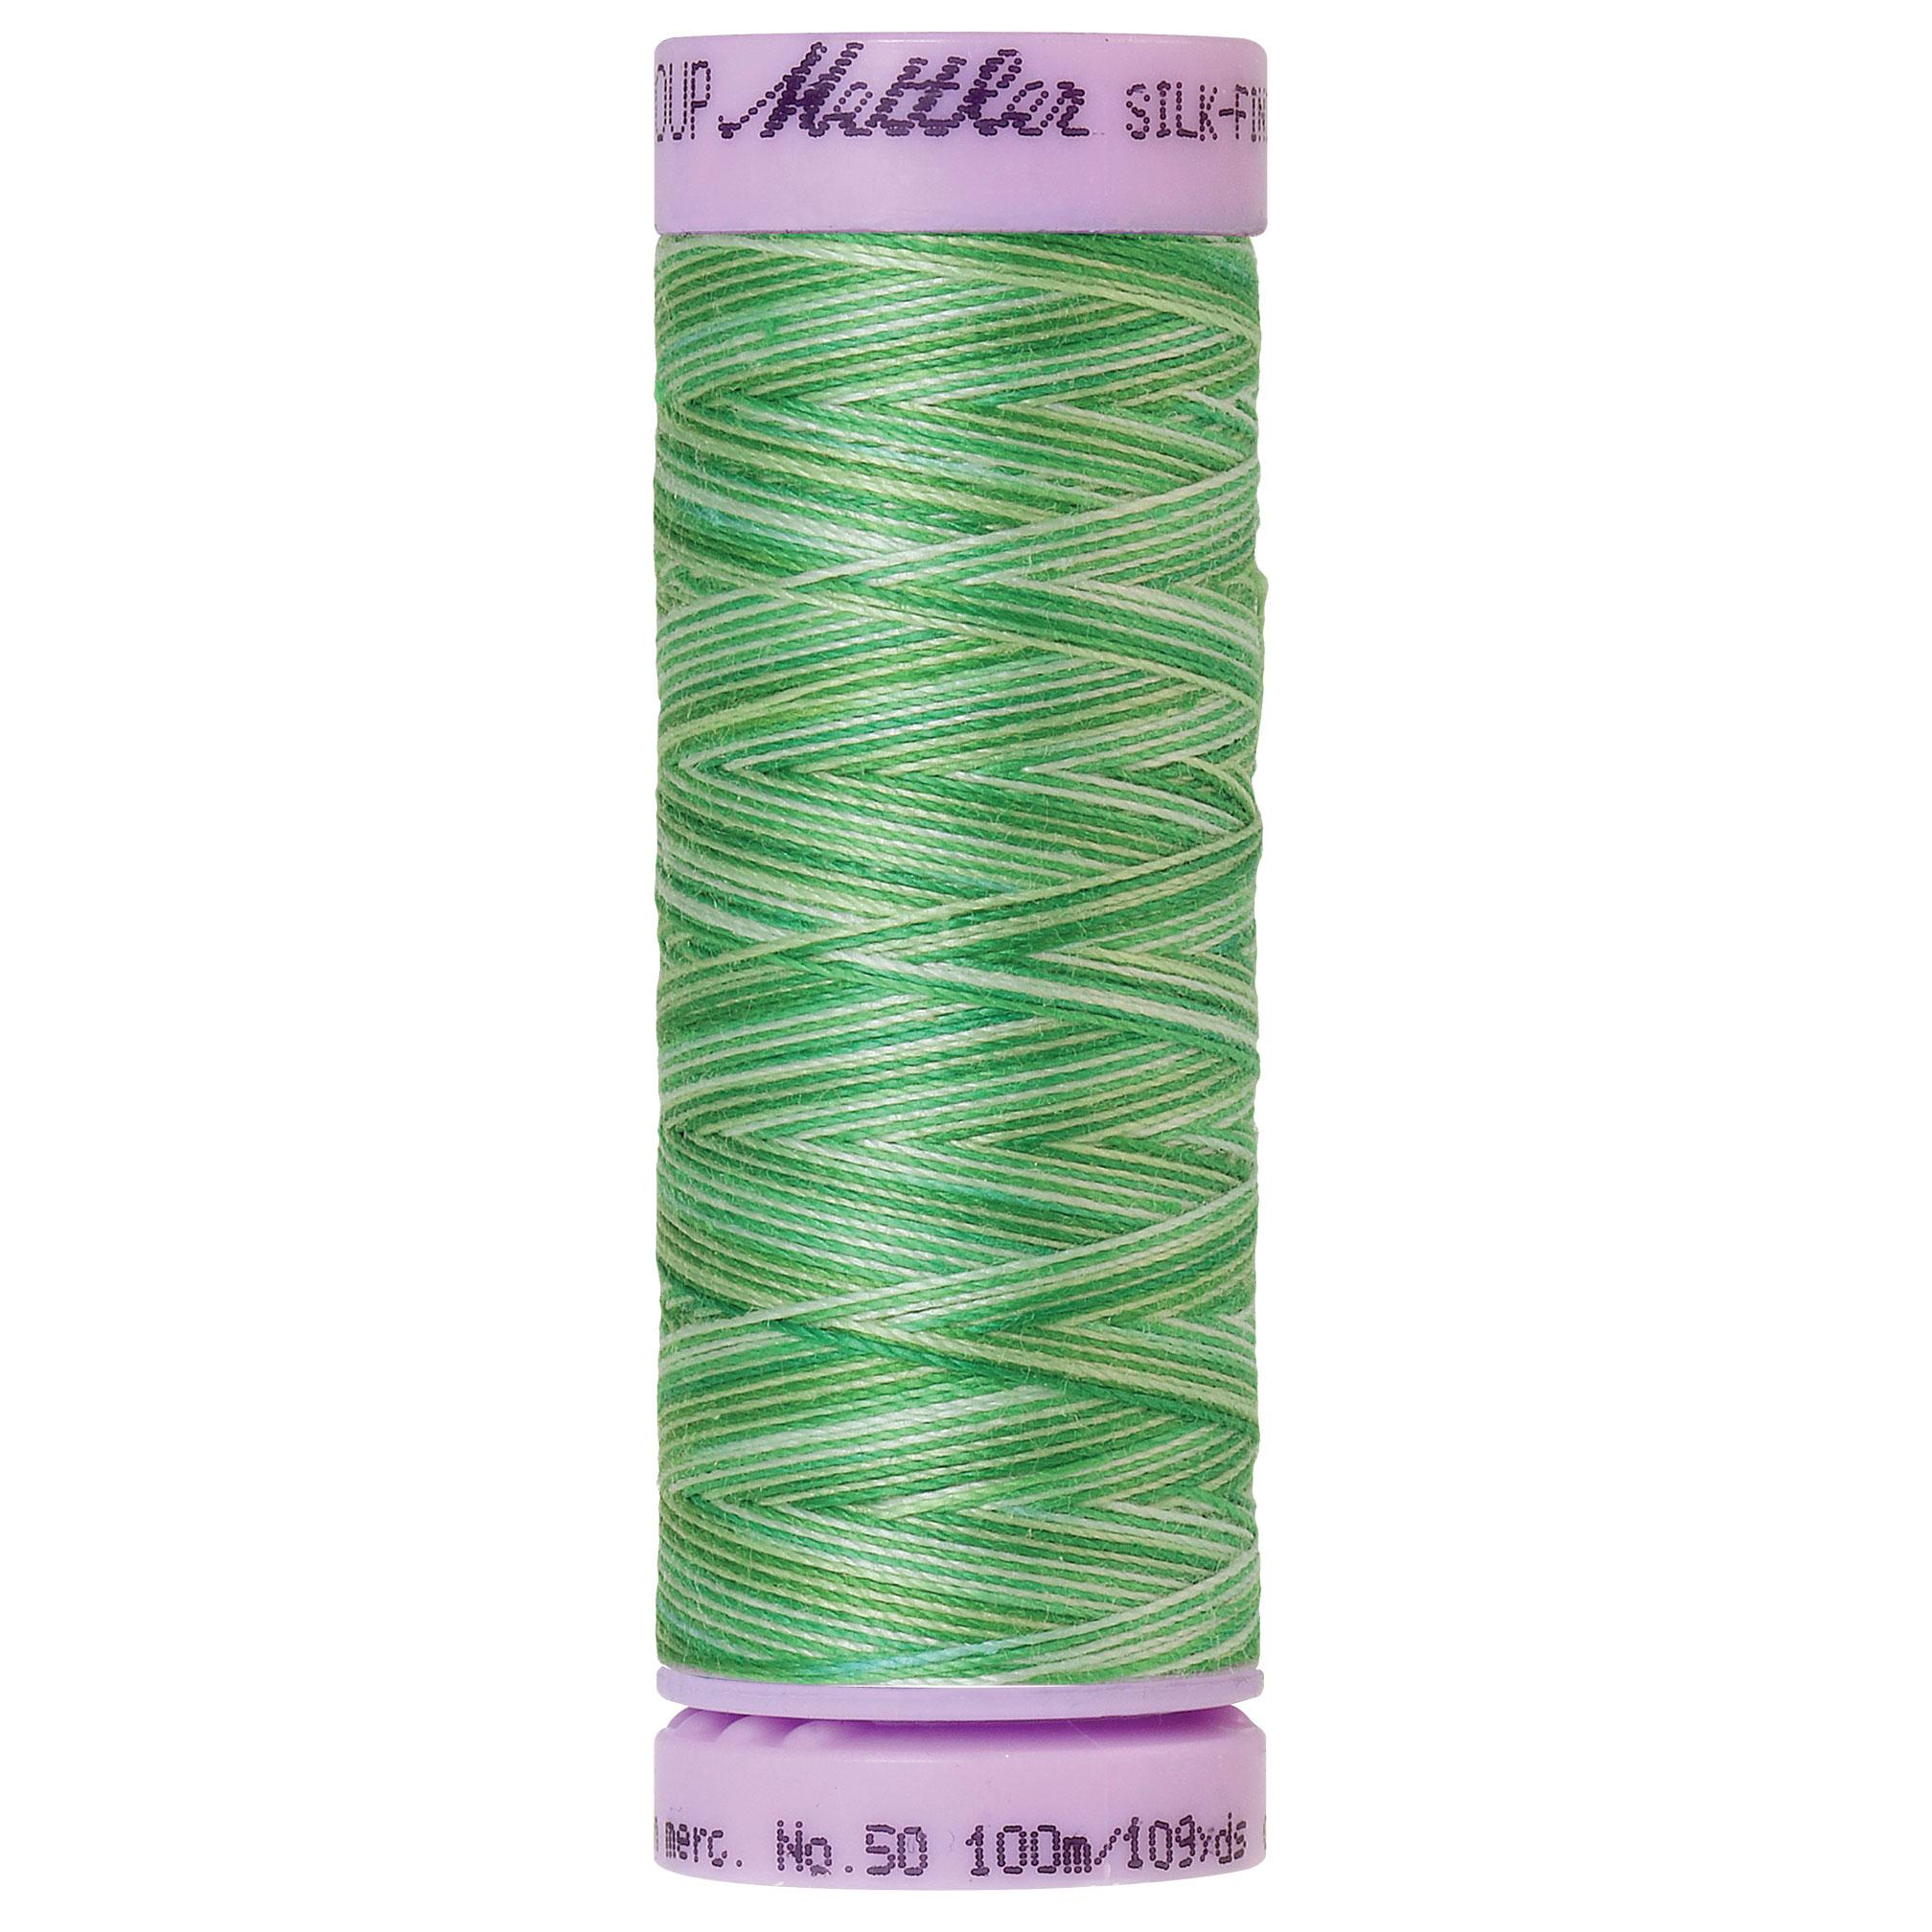 Silk Finish cotton 50wt 109 yards Minty